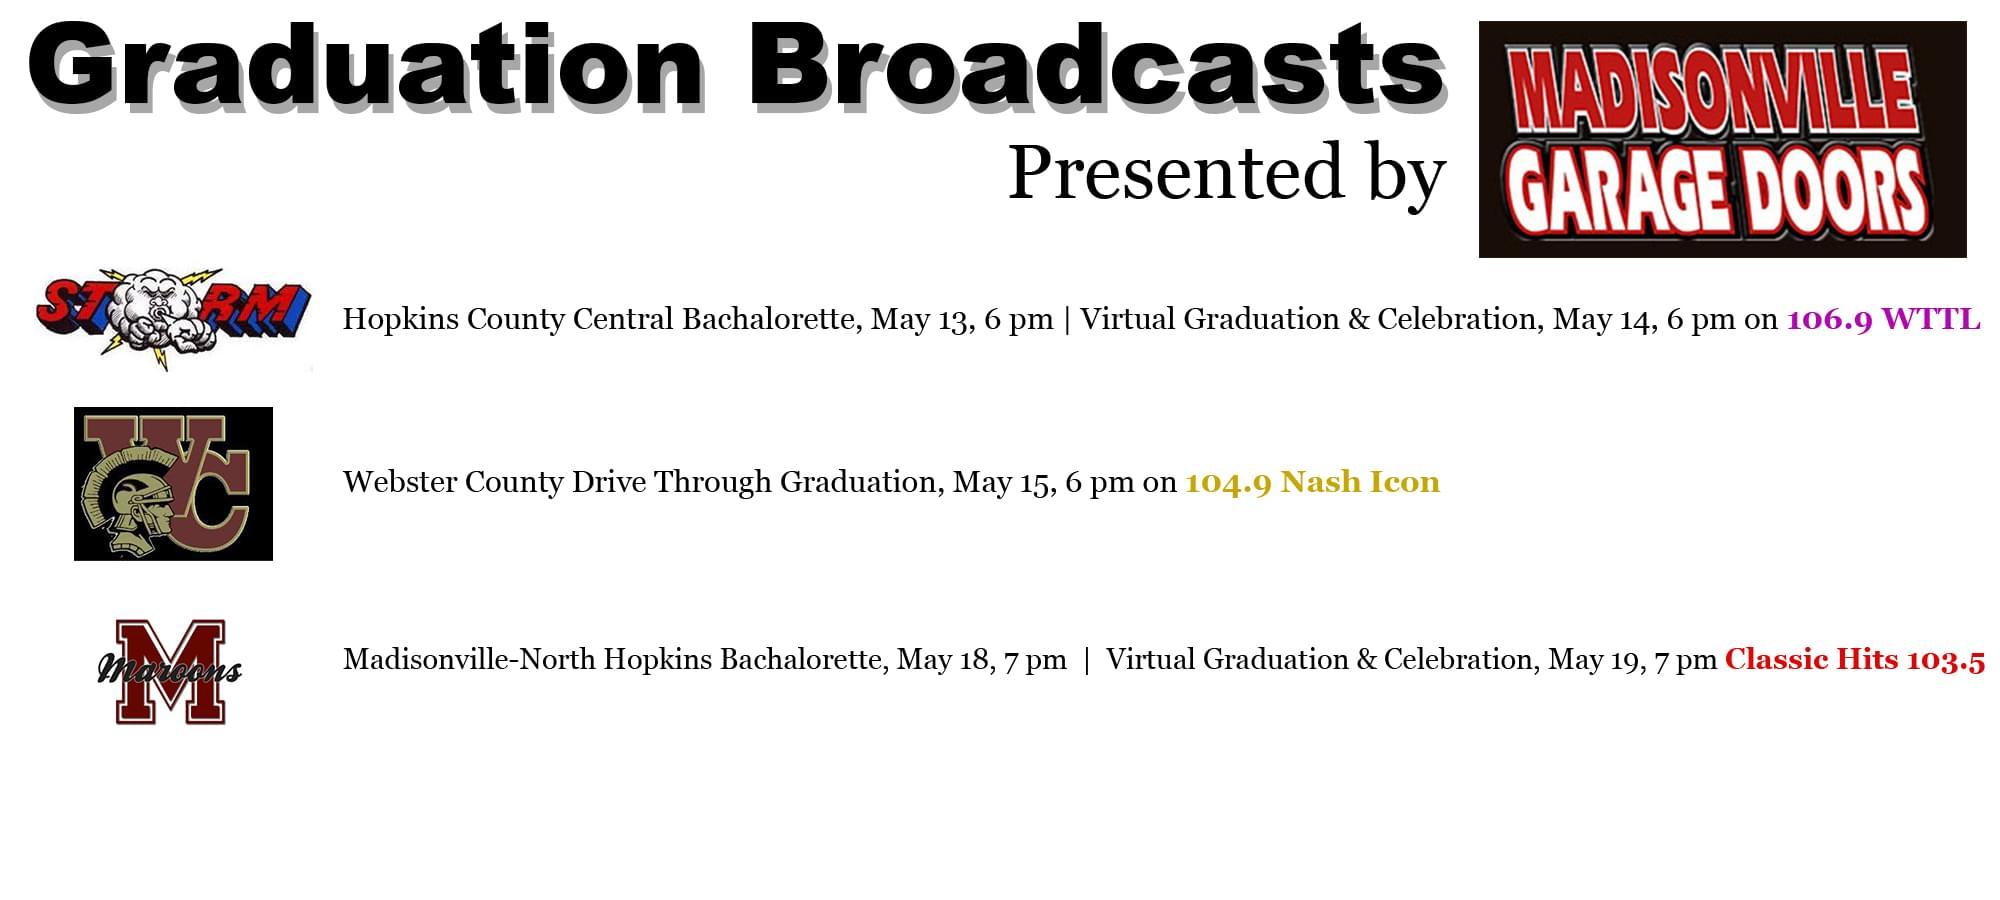 Graduation Broadcasts